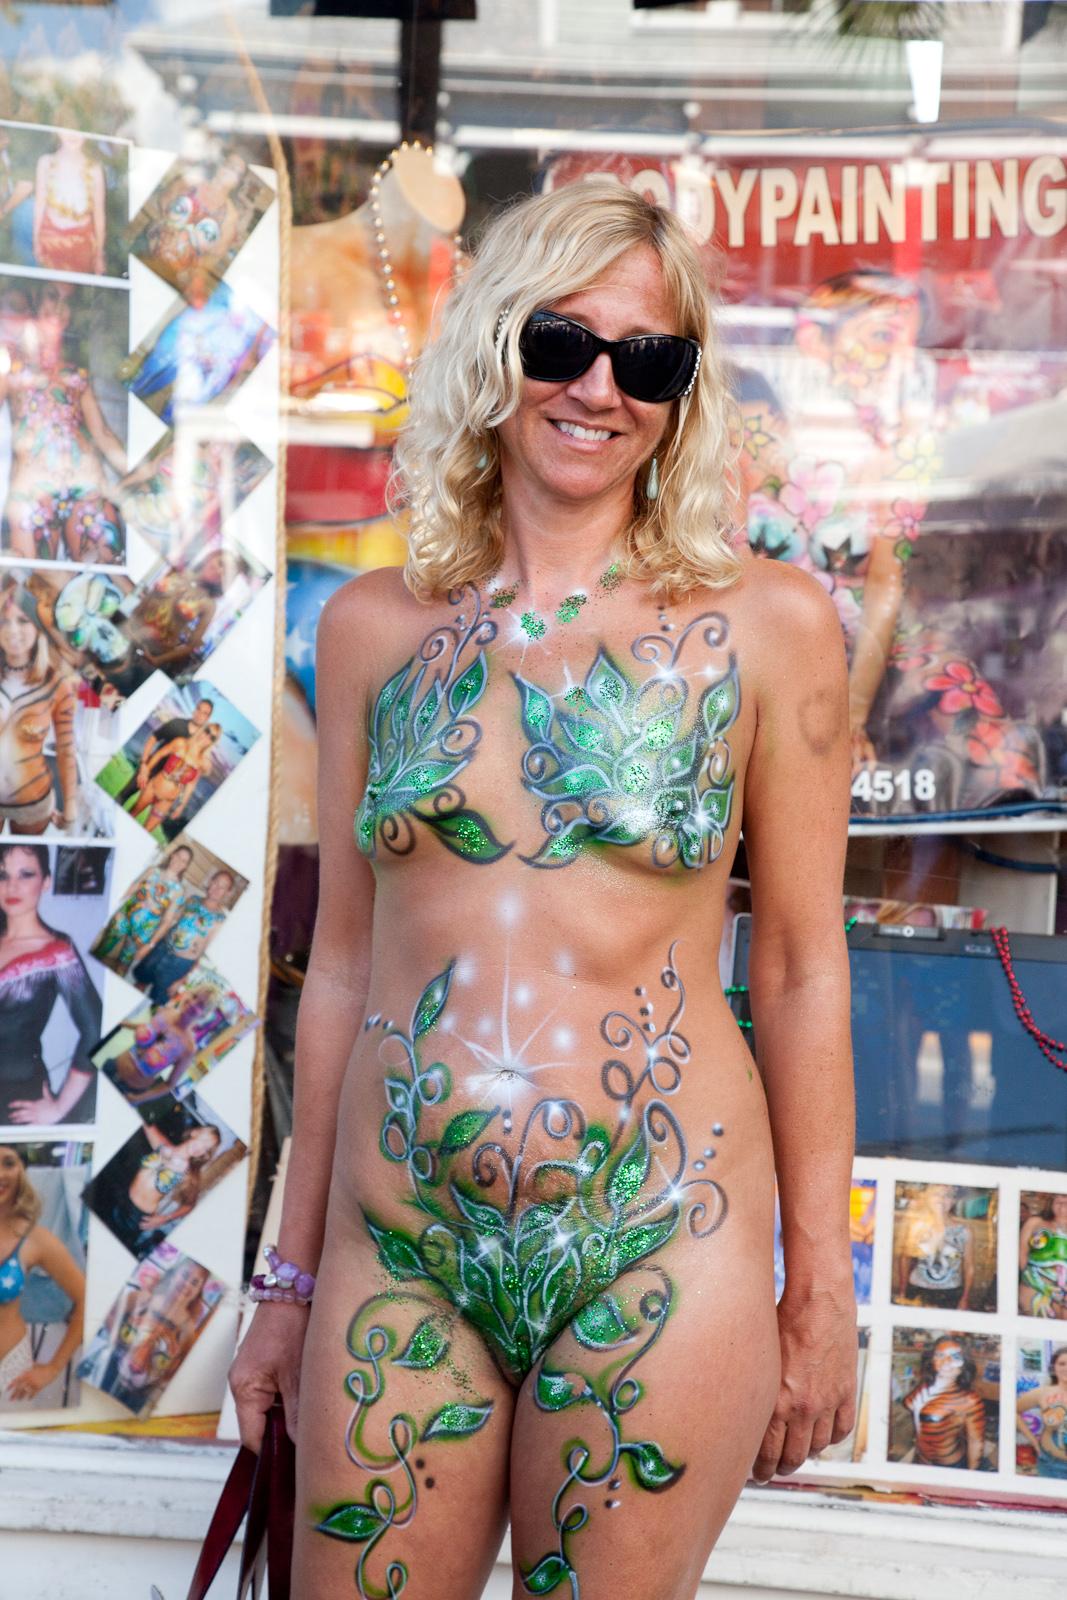 European Paint Body Ii West Palm Beach Fl